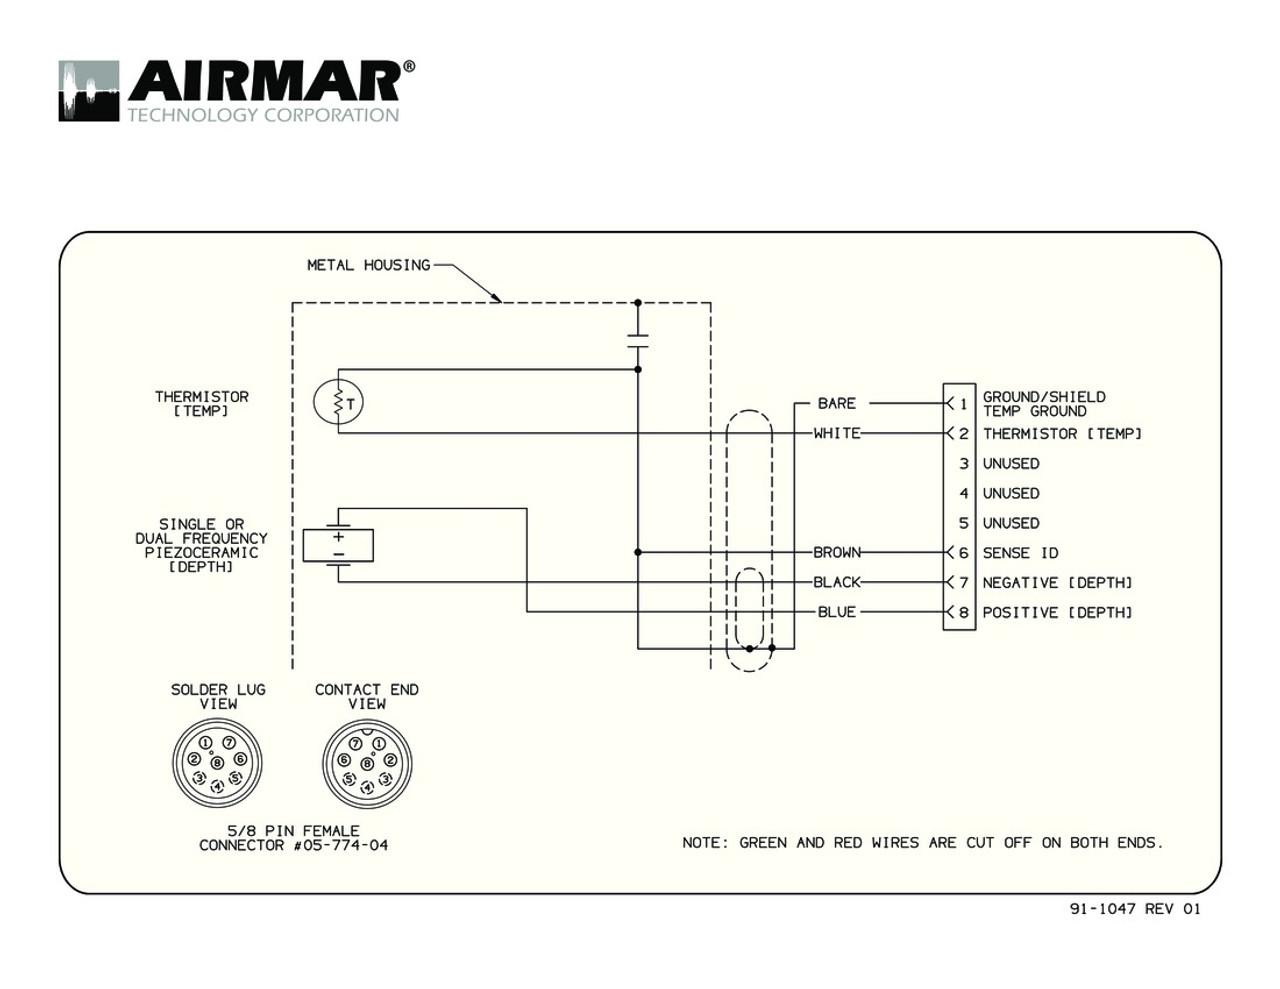 airmar wiring diagram garmin b117 8 pin d t blue bottle marine 8 [ 1280 x 989 Pixel ]